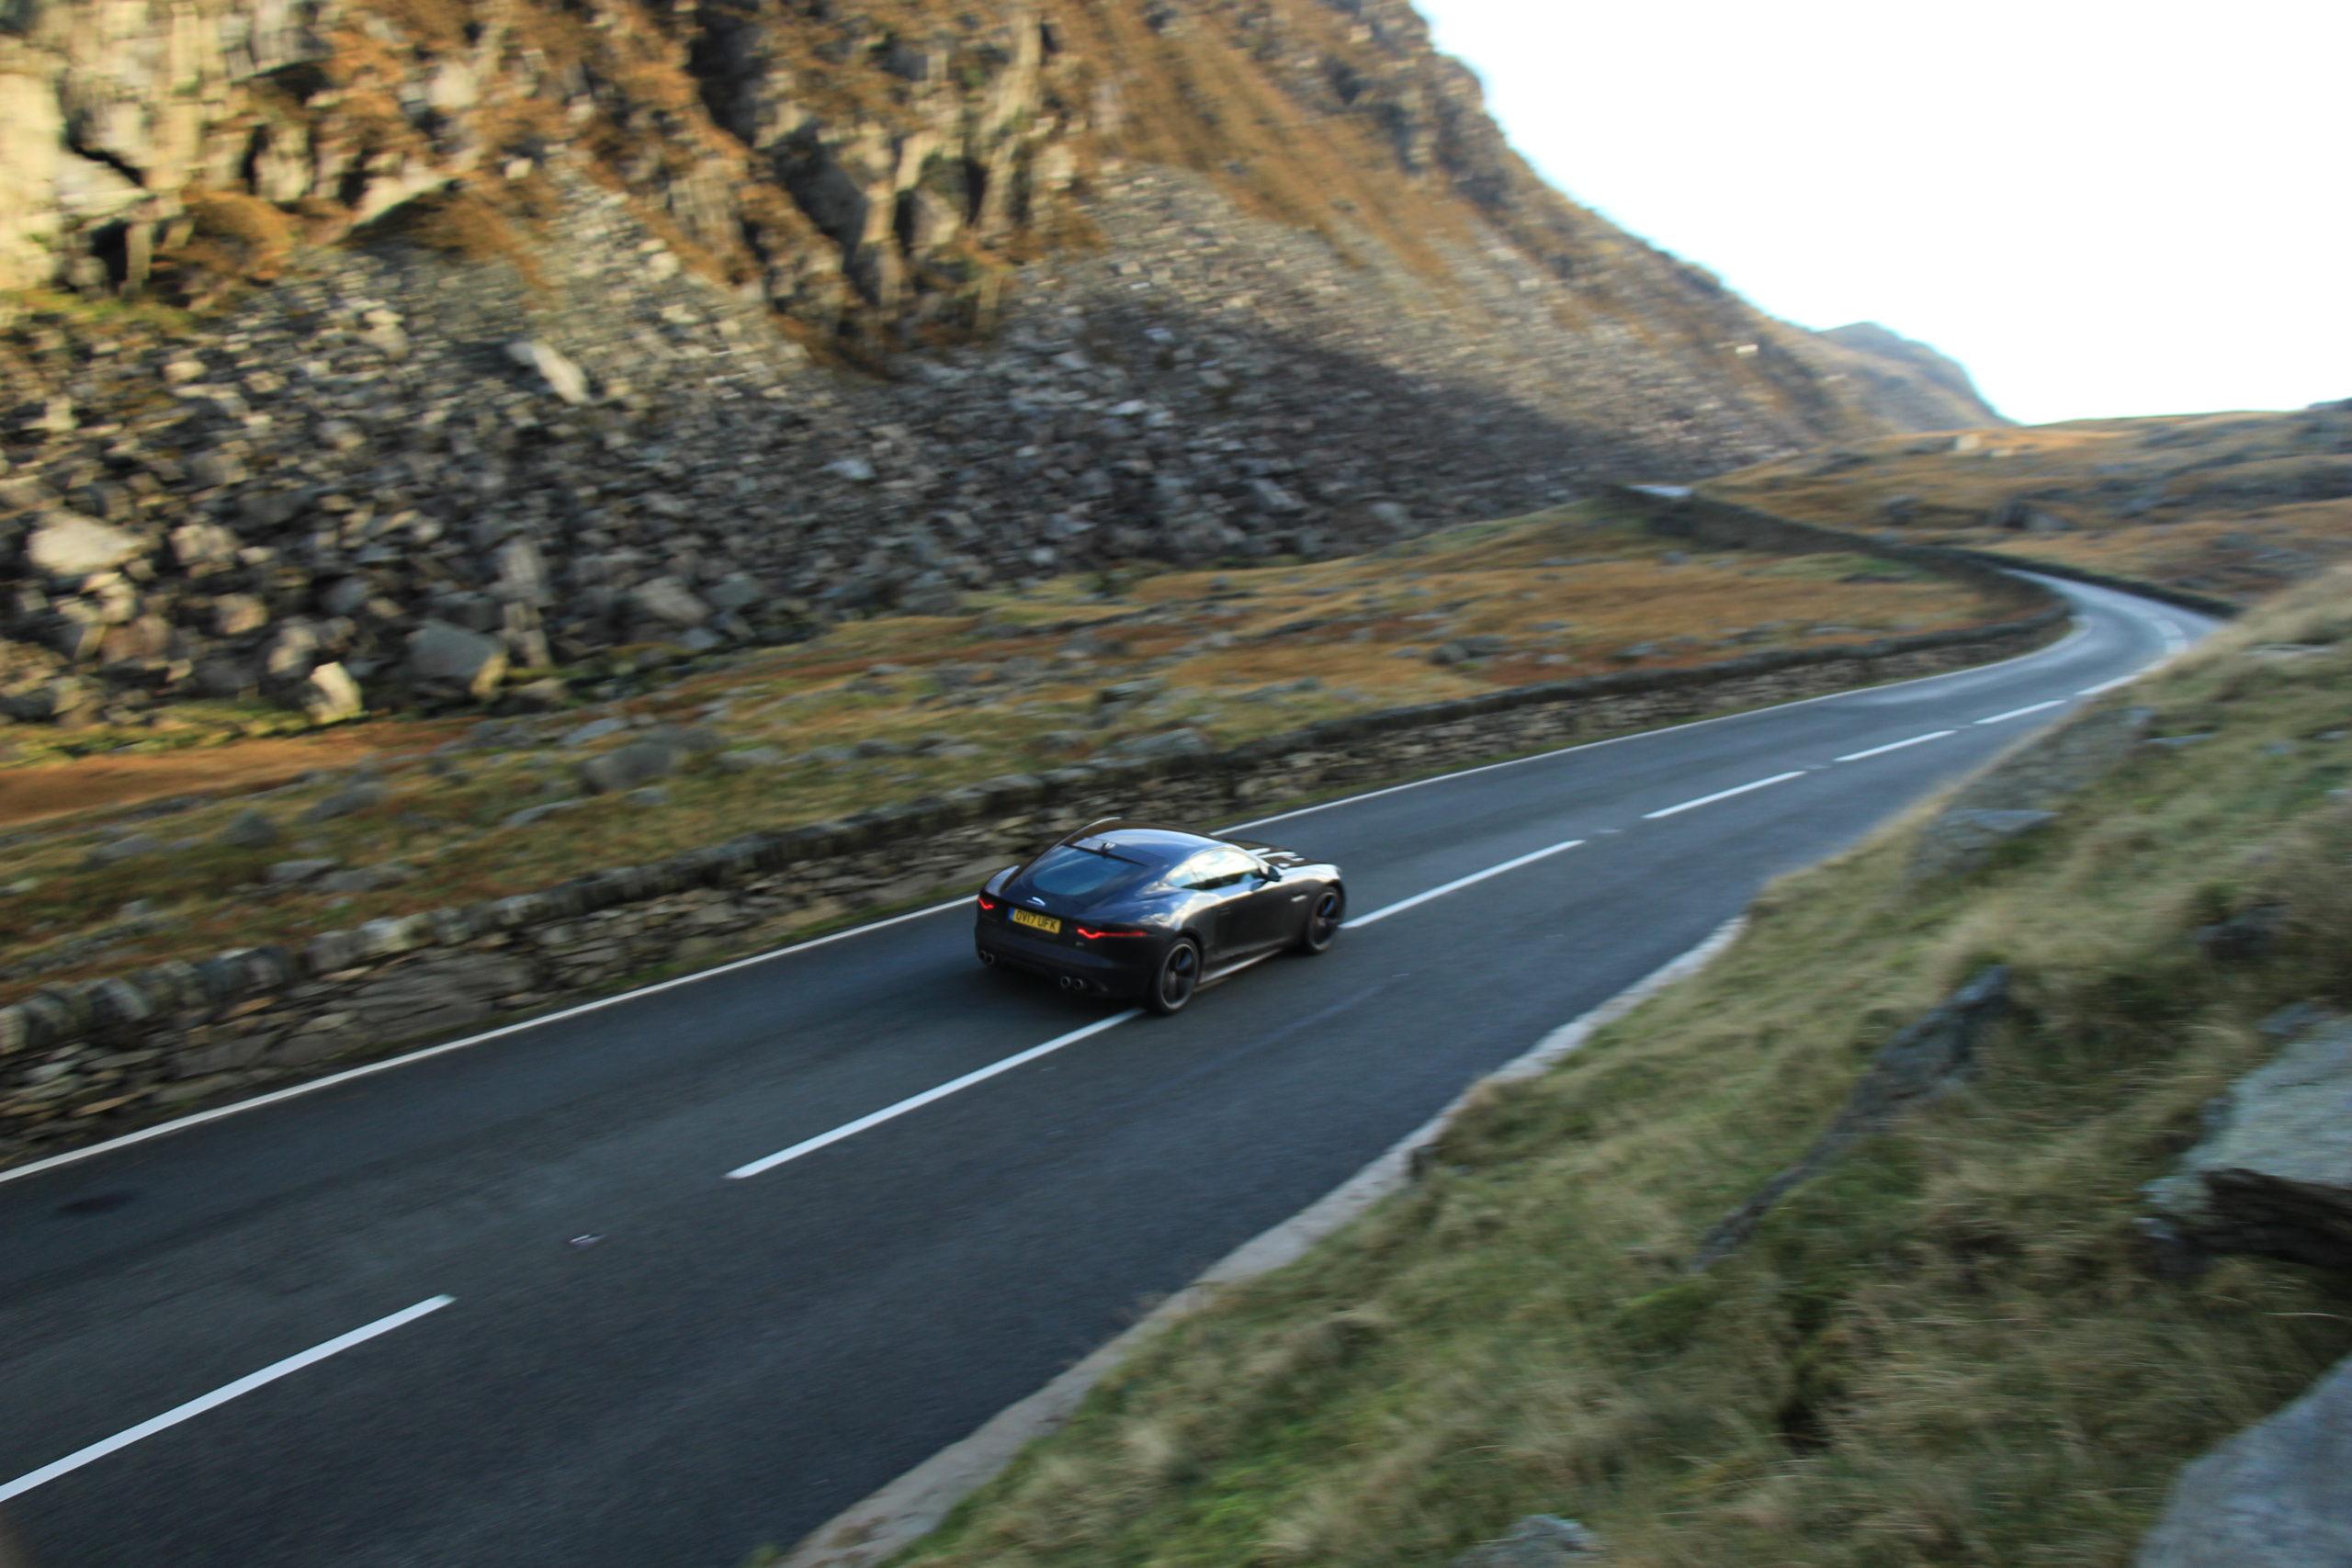 Scenic Drives UK - The Llanberis Pass